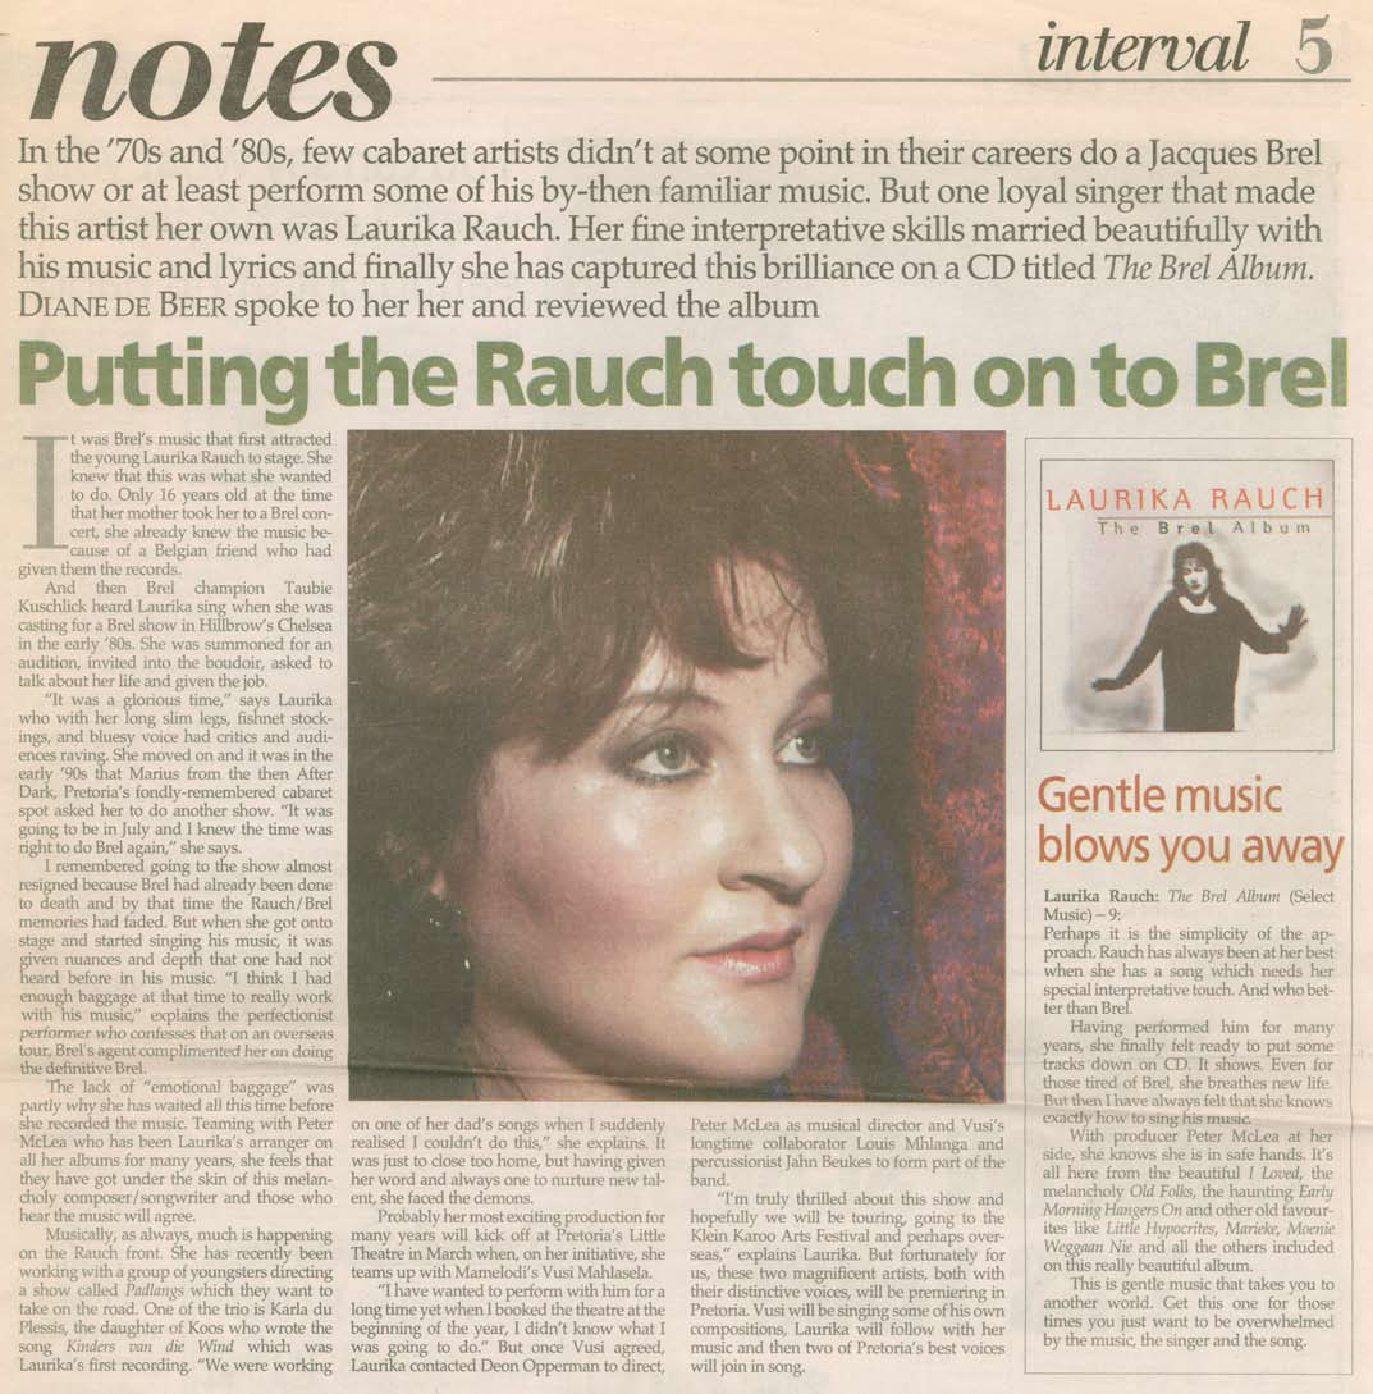 1998-pretoria-news-putting-rauch-touch-on-brel